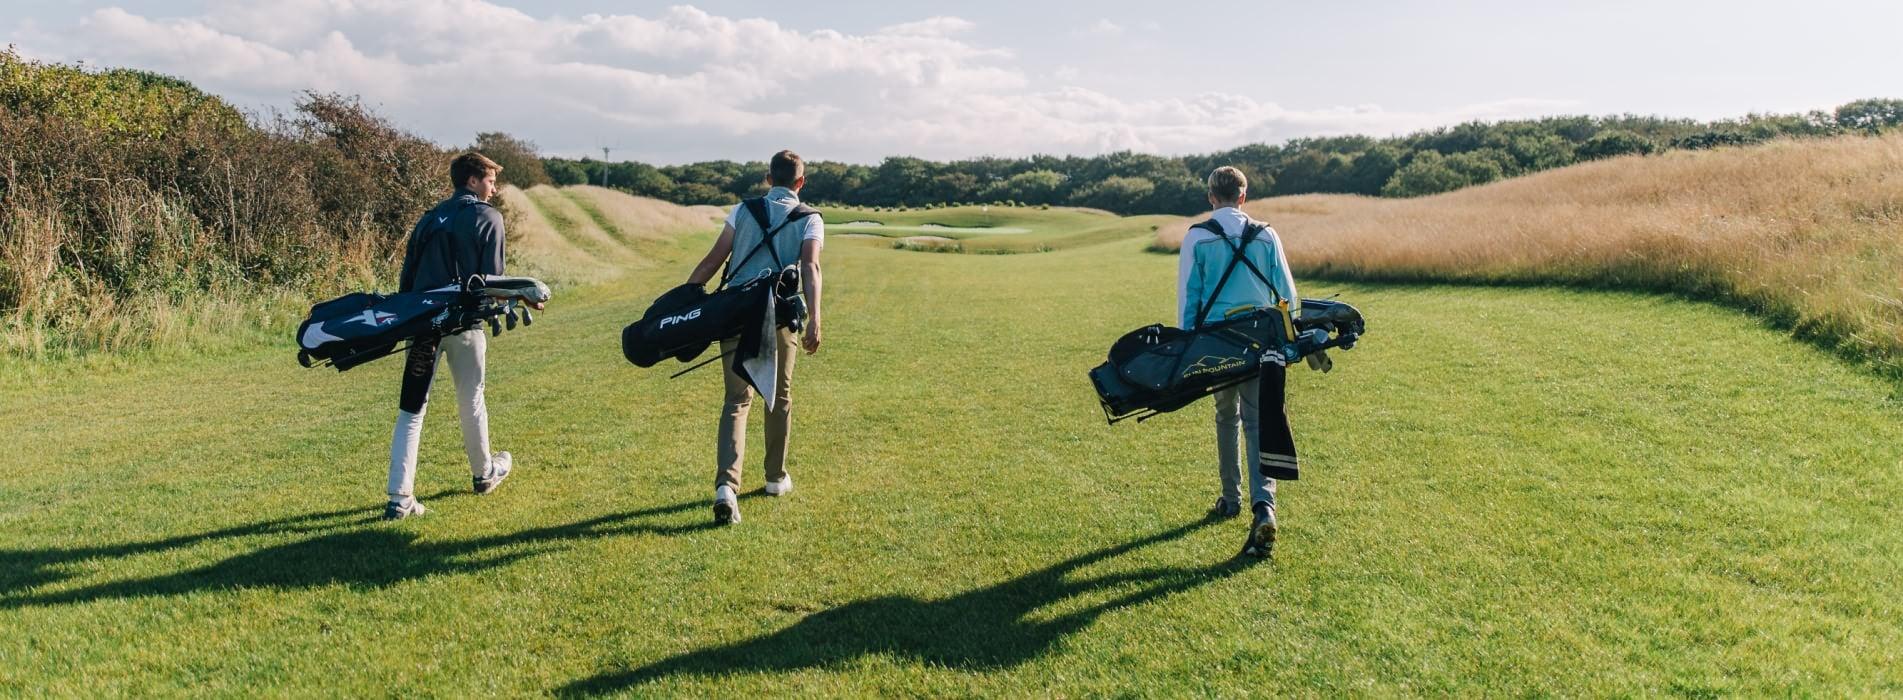 Golf Area representative